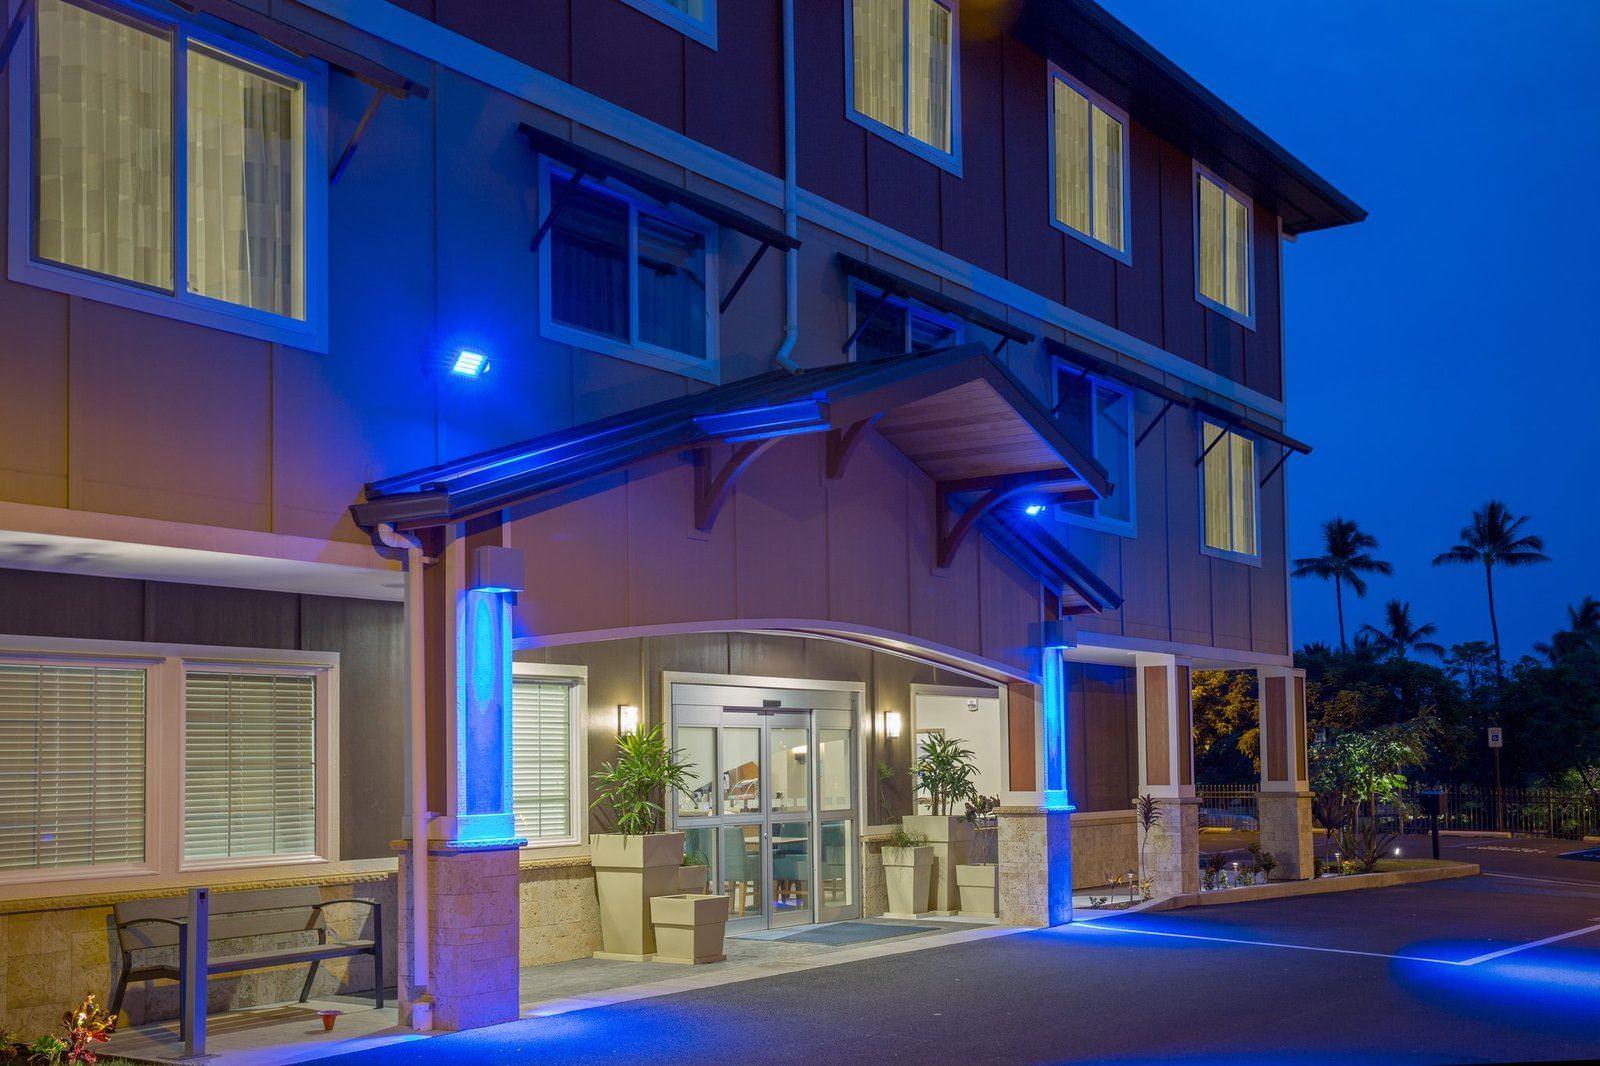 Ultimate List of Best Luxury Hotels in Hilo, Hawaii, Holiday Inn Express & Suites Kailua-Kona